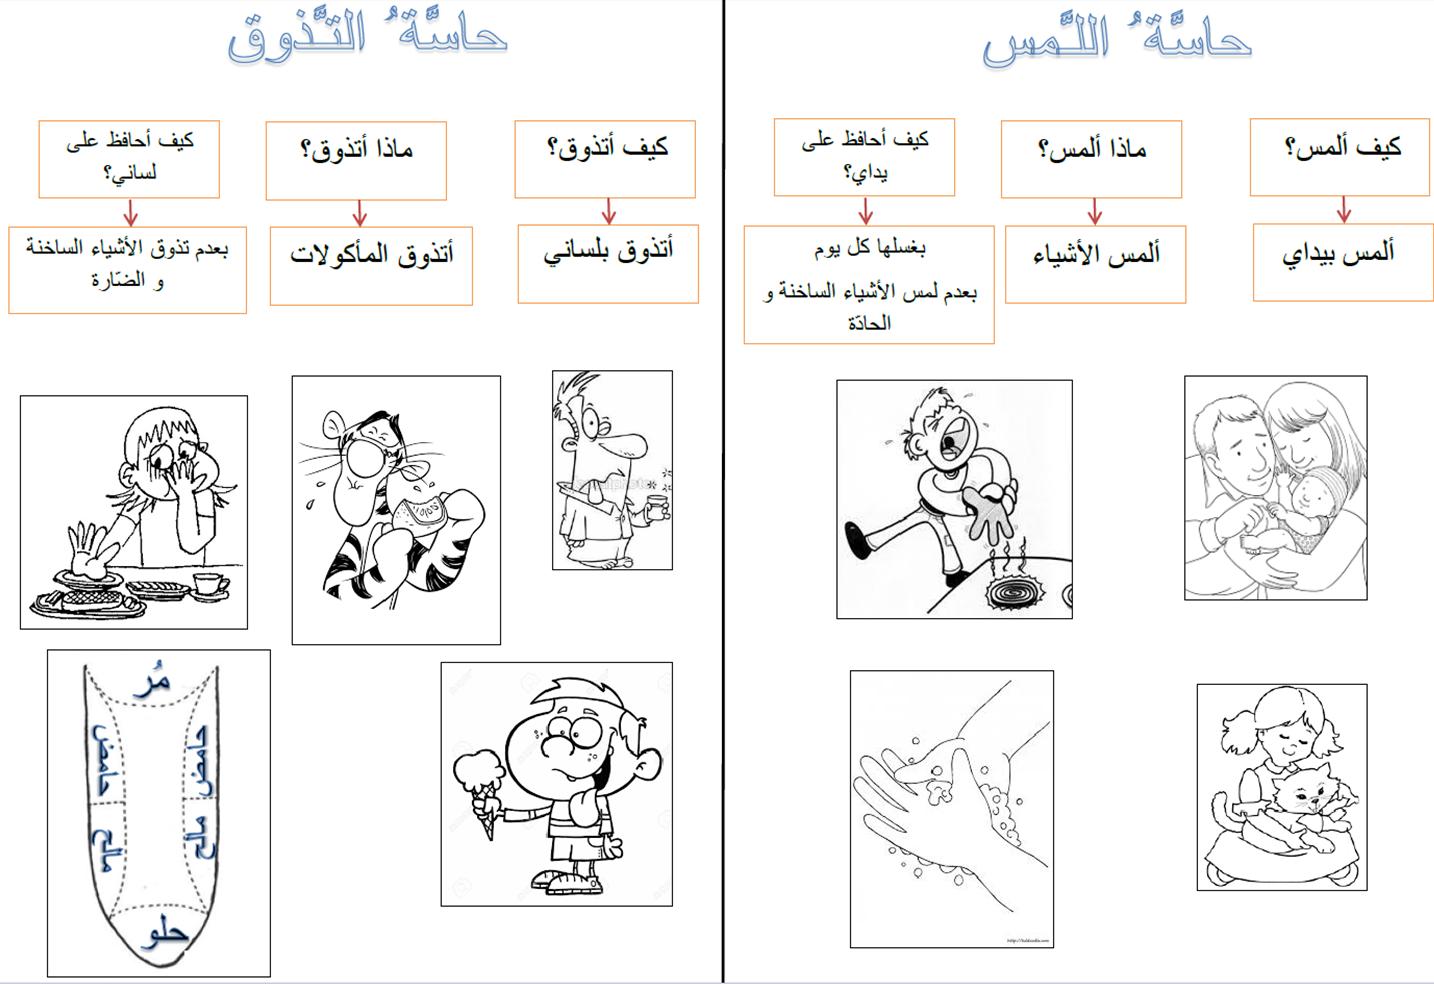 The Five Senses In Arabic Lesson Exercises P4 4 Teach Arabic Teaching Lesson [ 984 x 1434 Pixel ]